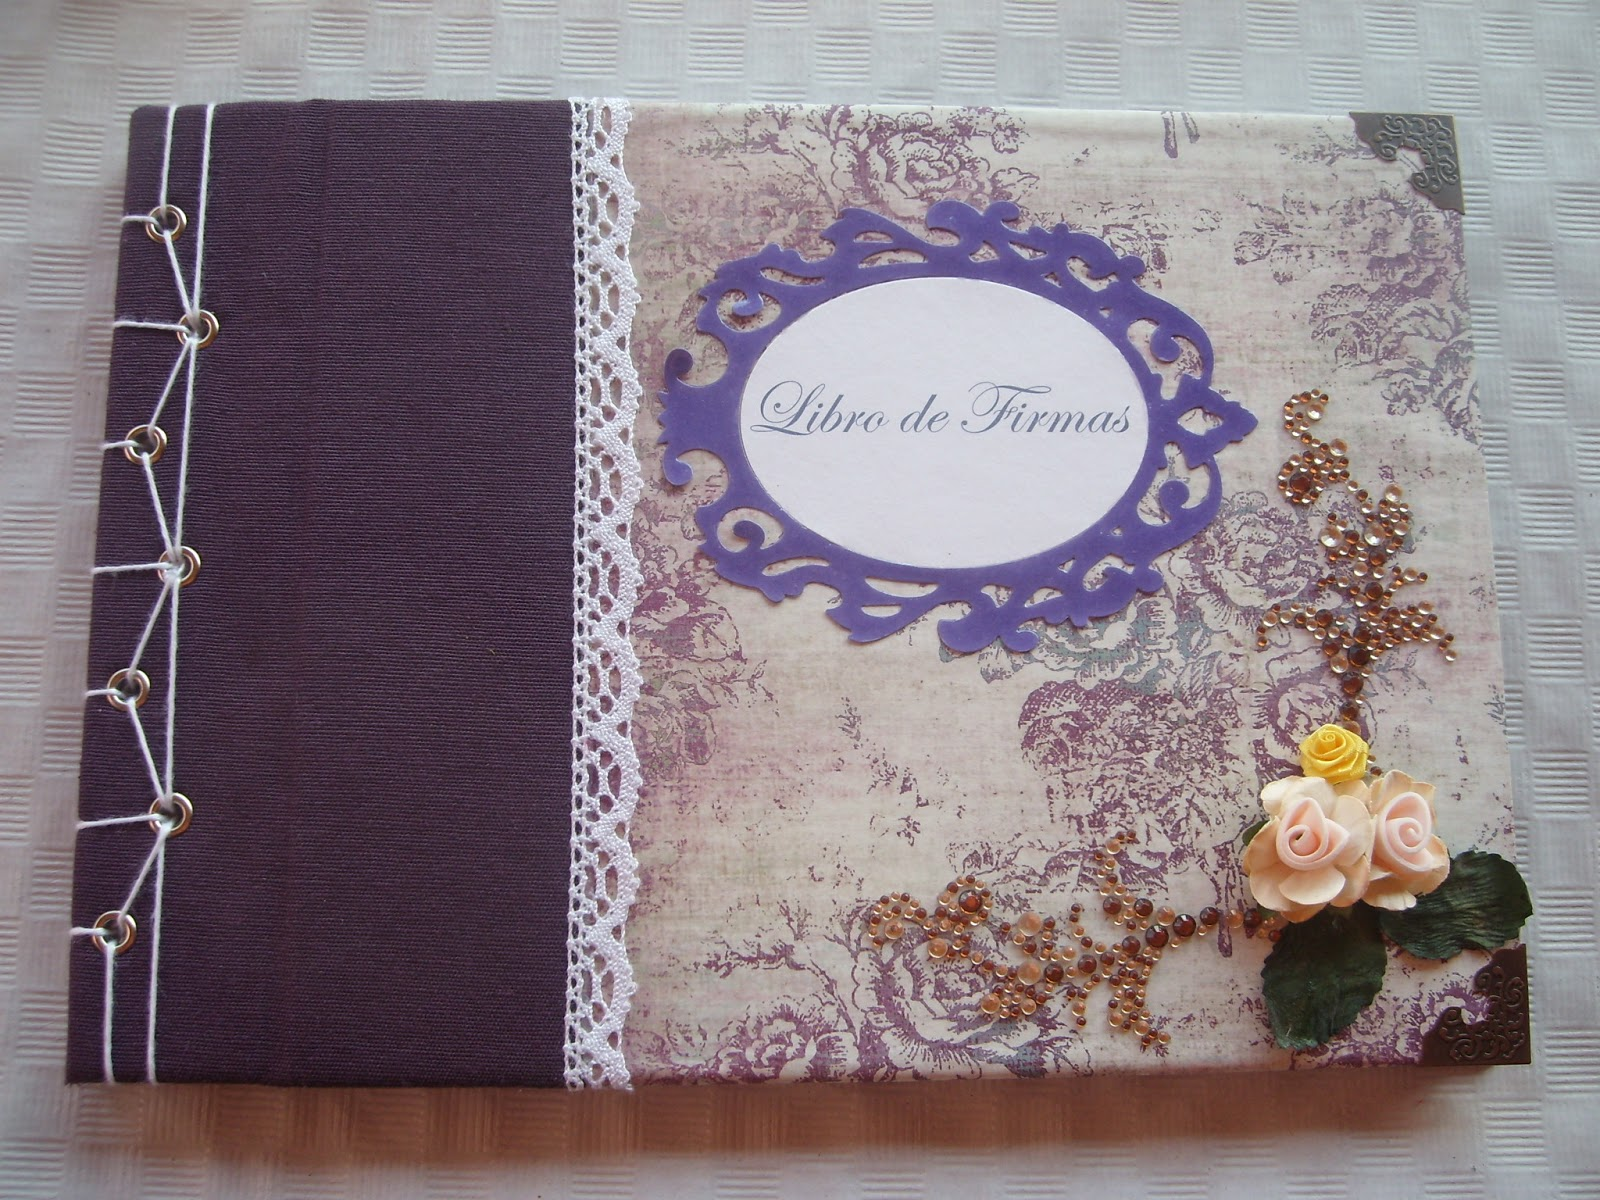 Duendes bajo mi cama libro de firmas para boda - Libros para decorar ...